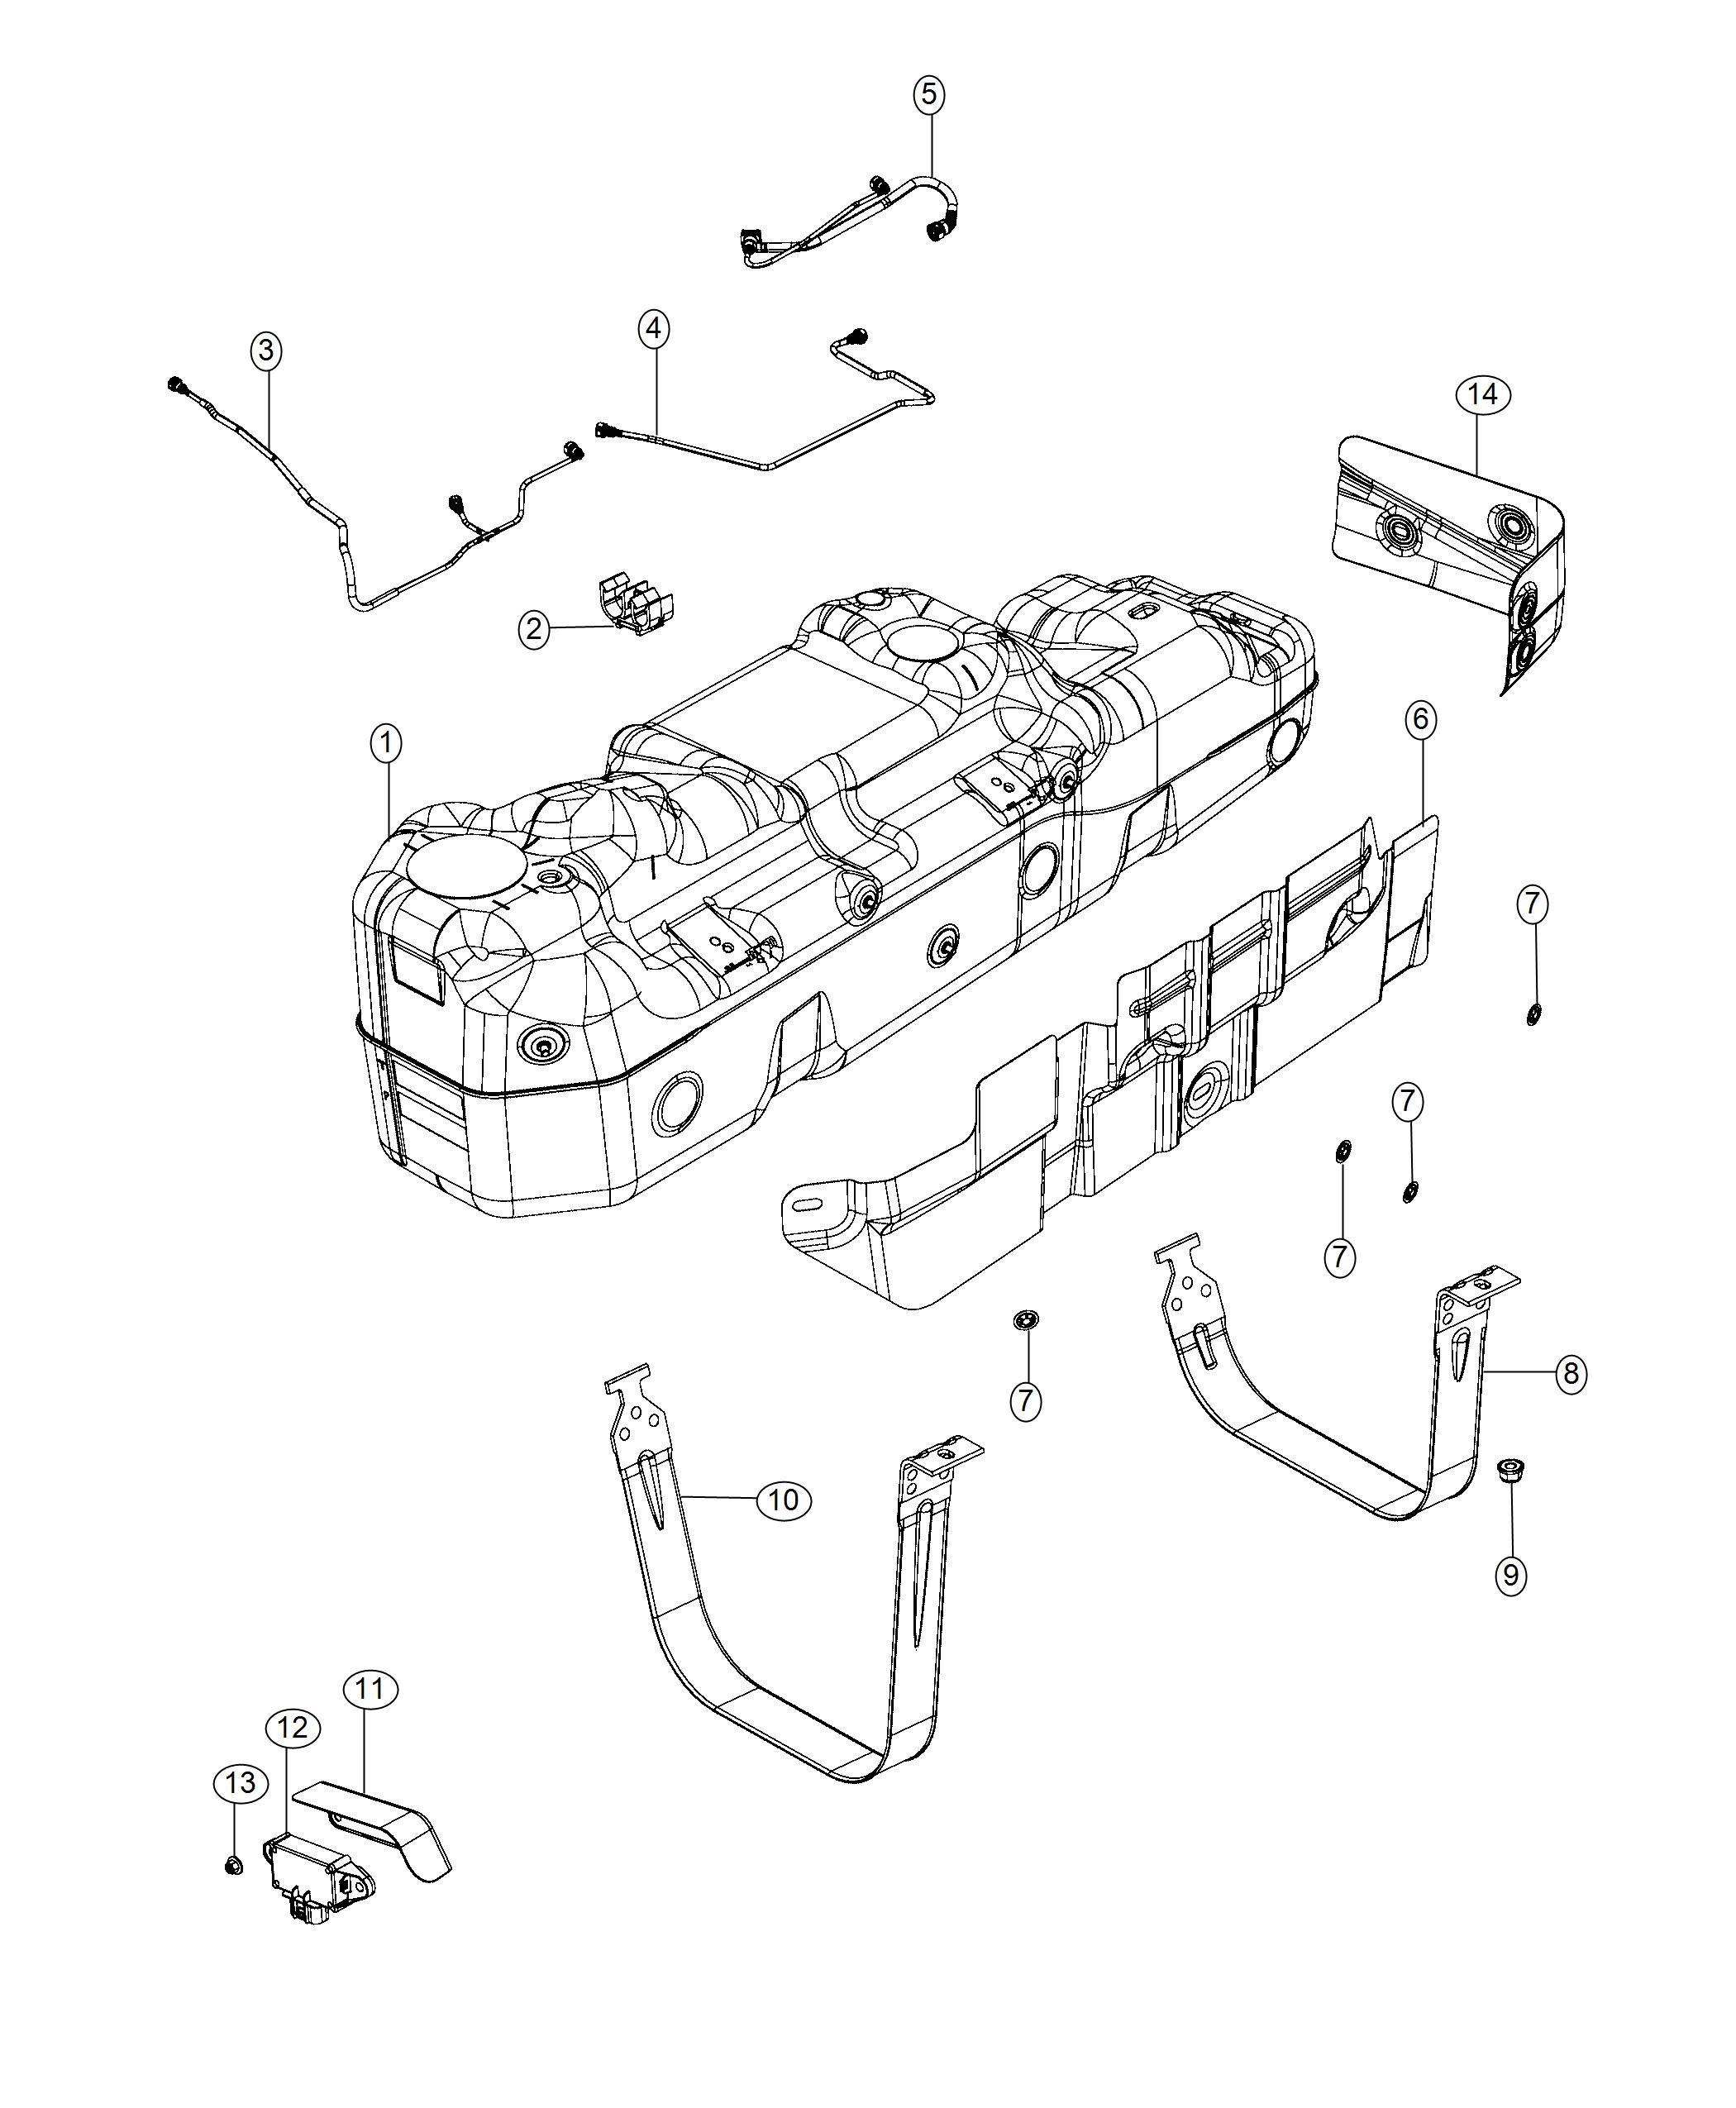 Ram Shield Fuel Tank Heat 23 Gallon Fuel Tank